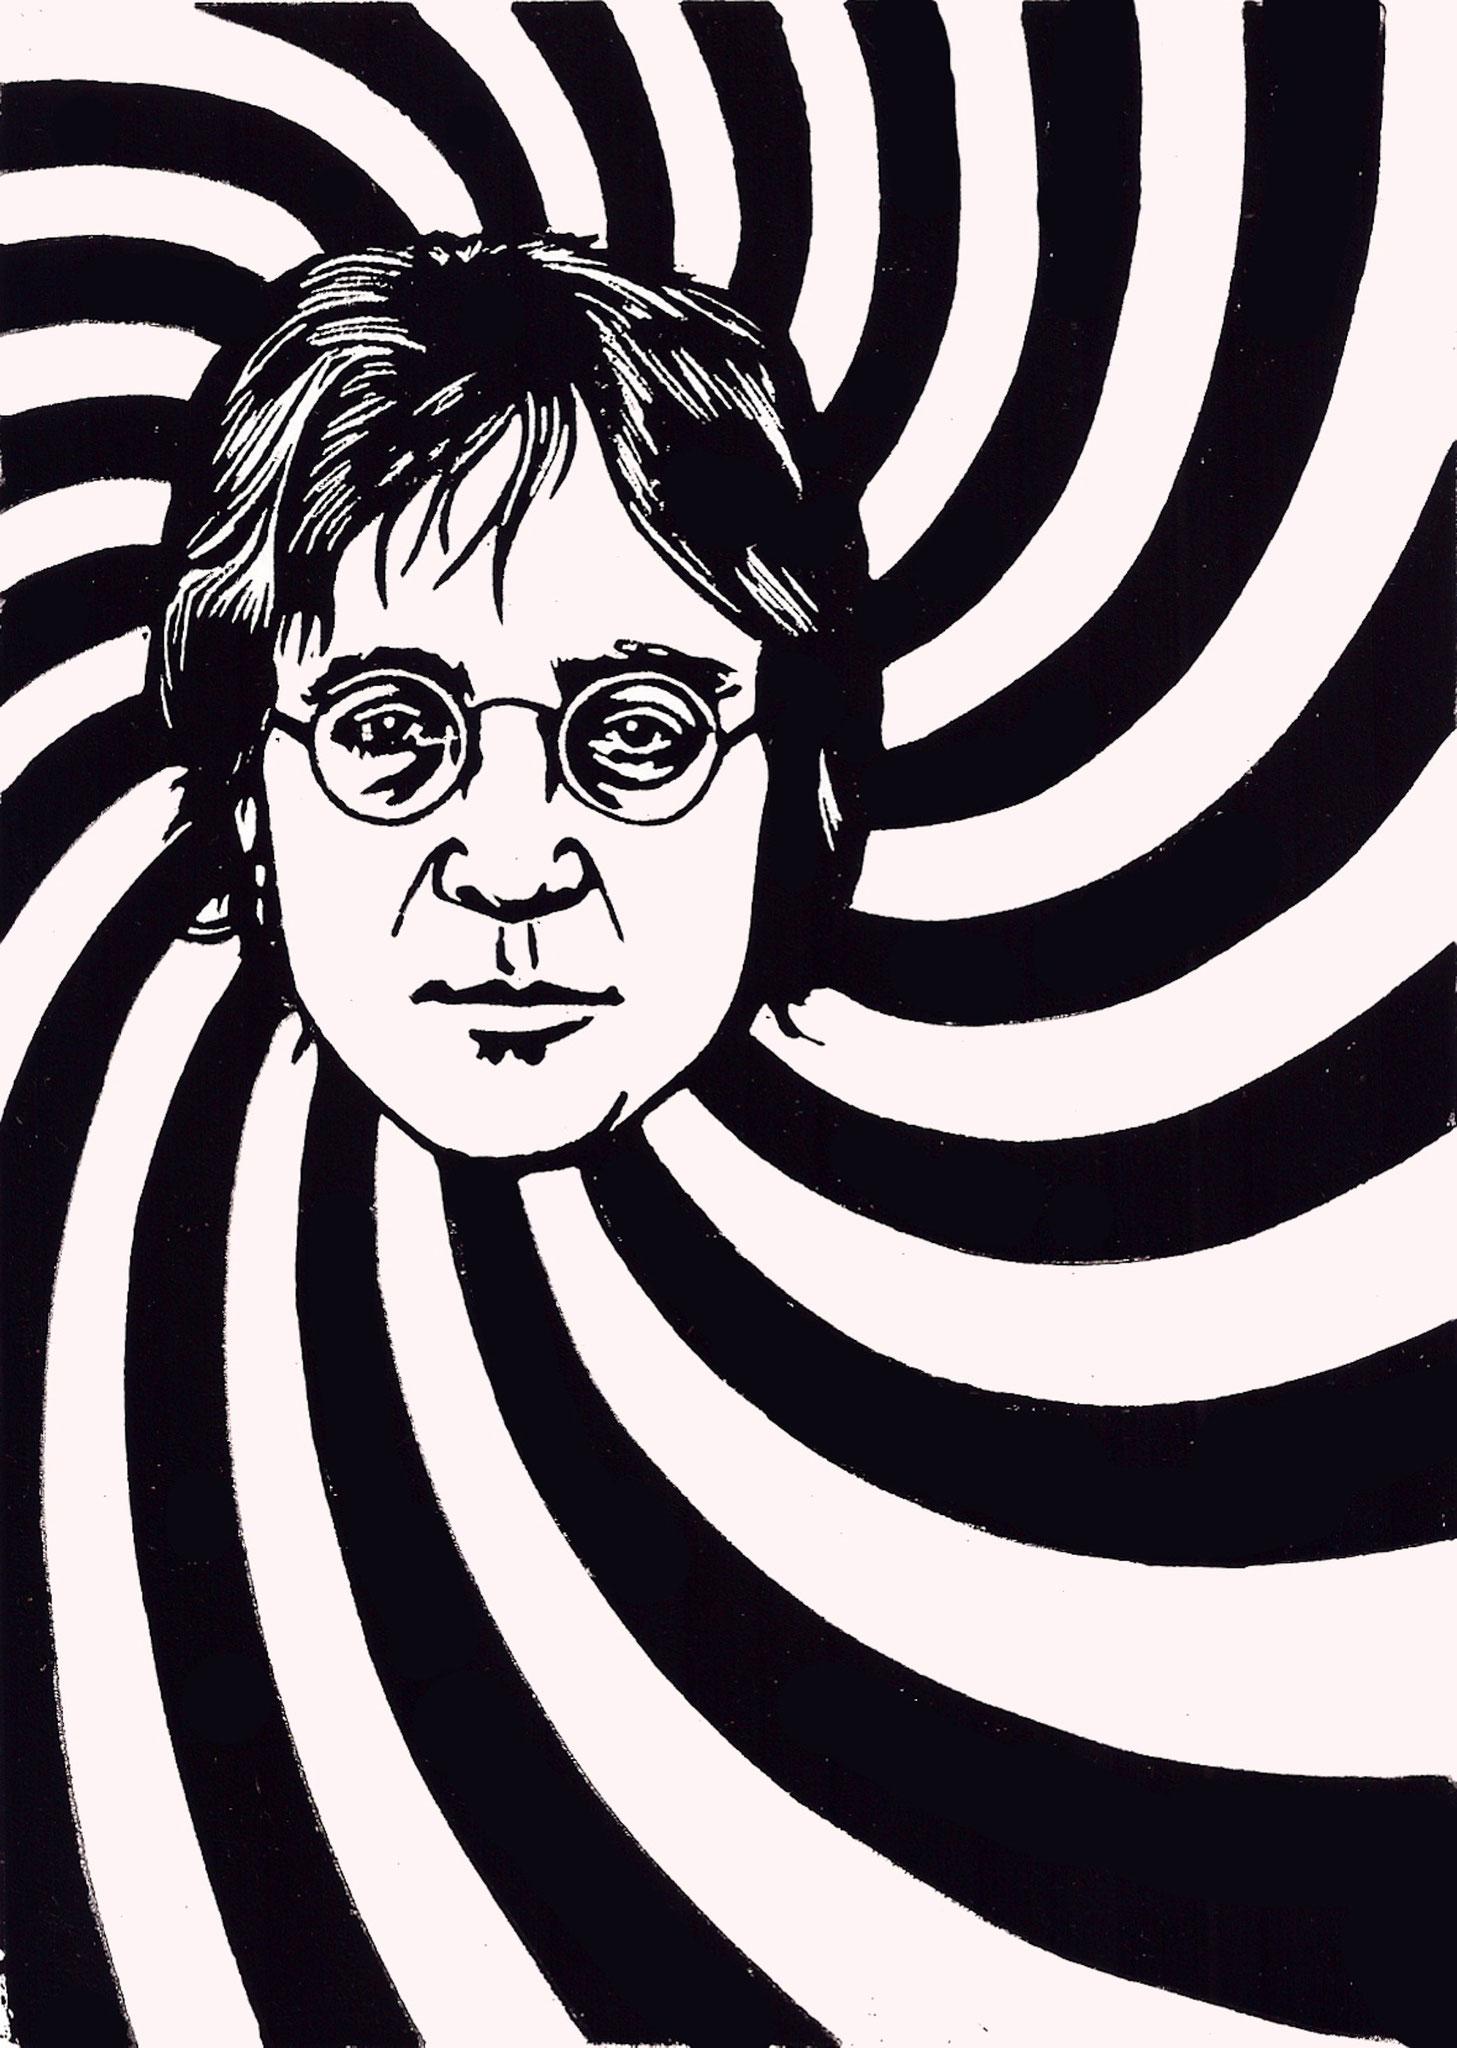 John Lennon, 13/01/2018, Edition 5, A5